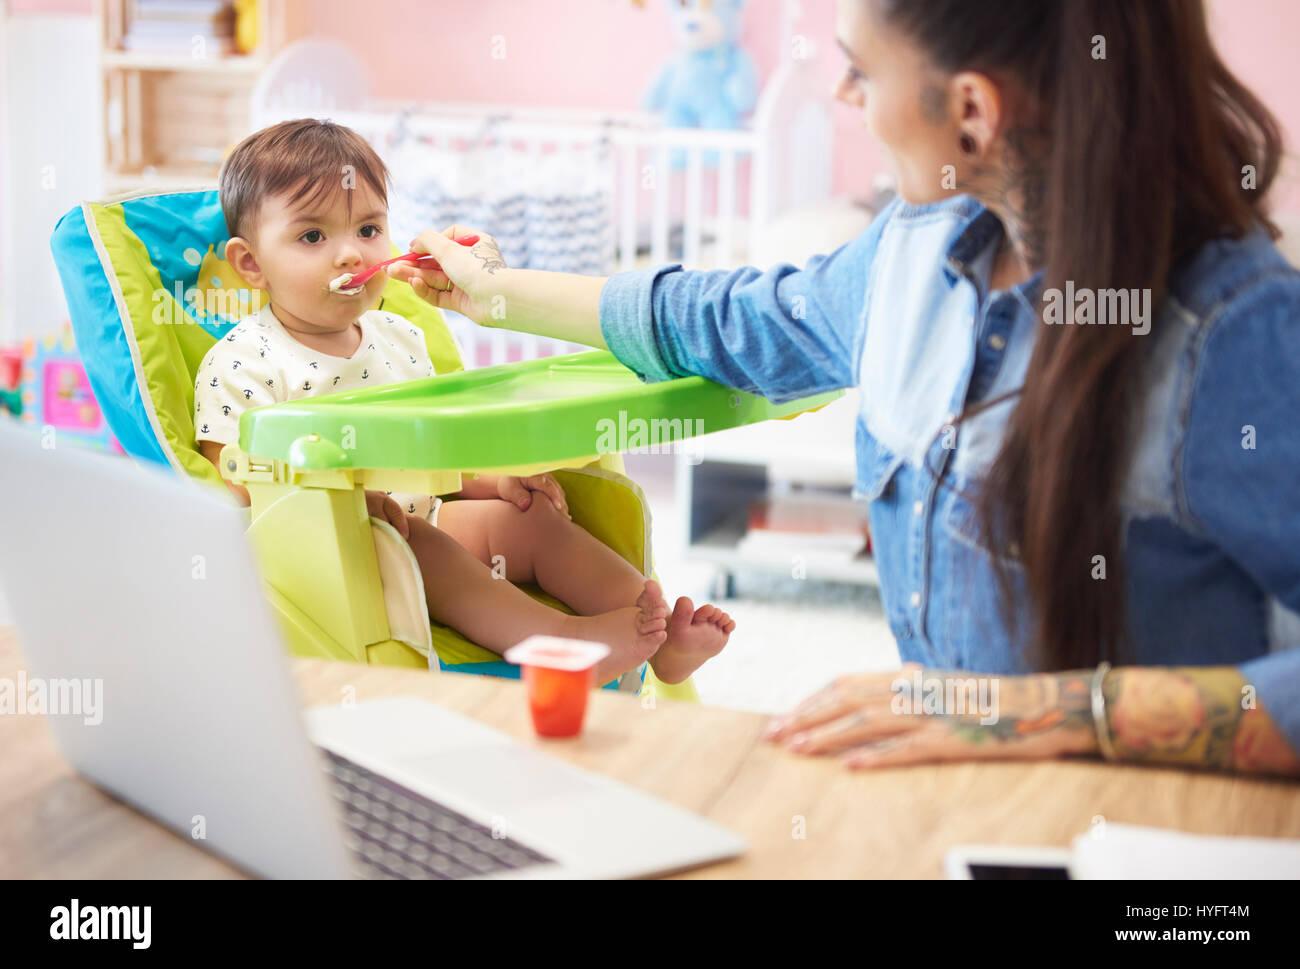 Mother feeding boy with yoghurt - Stock Image